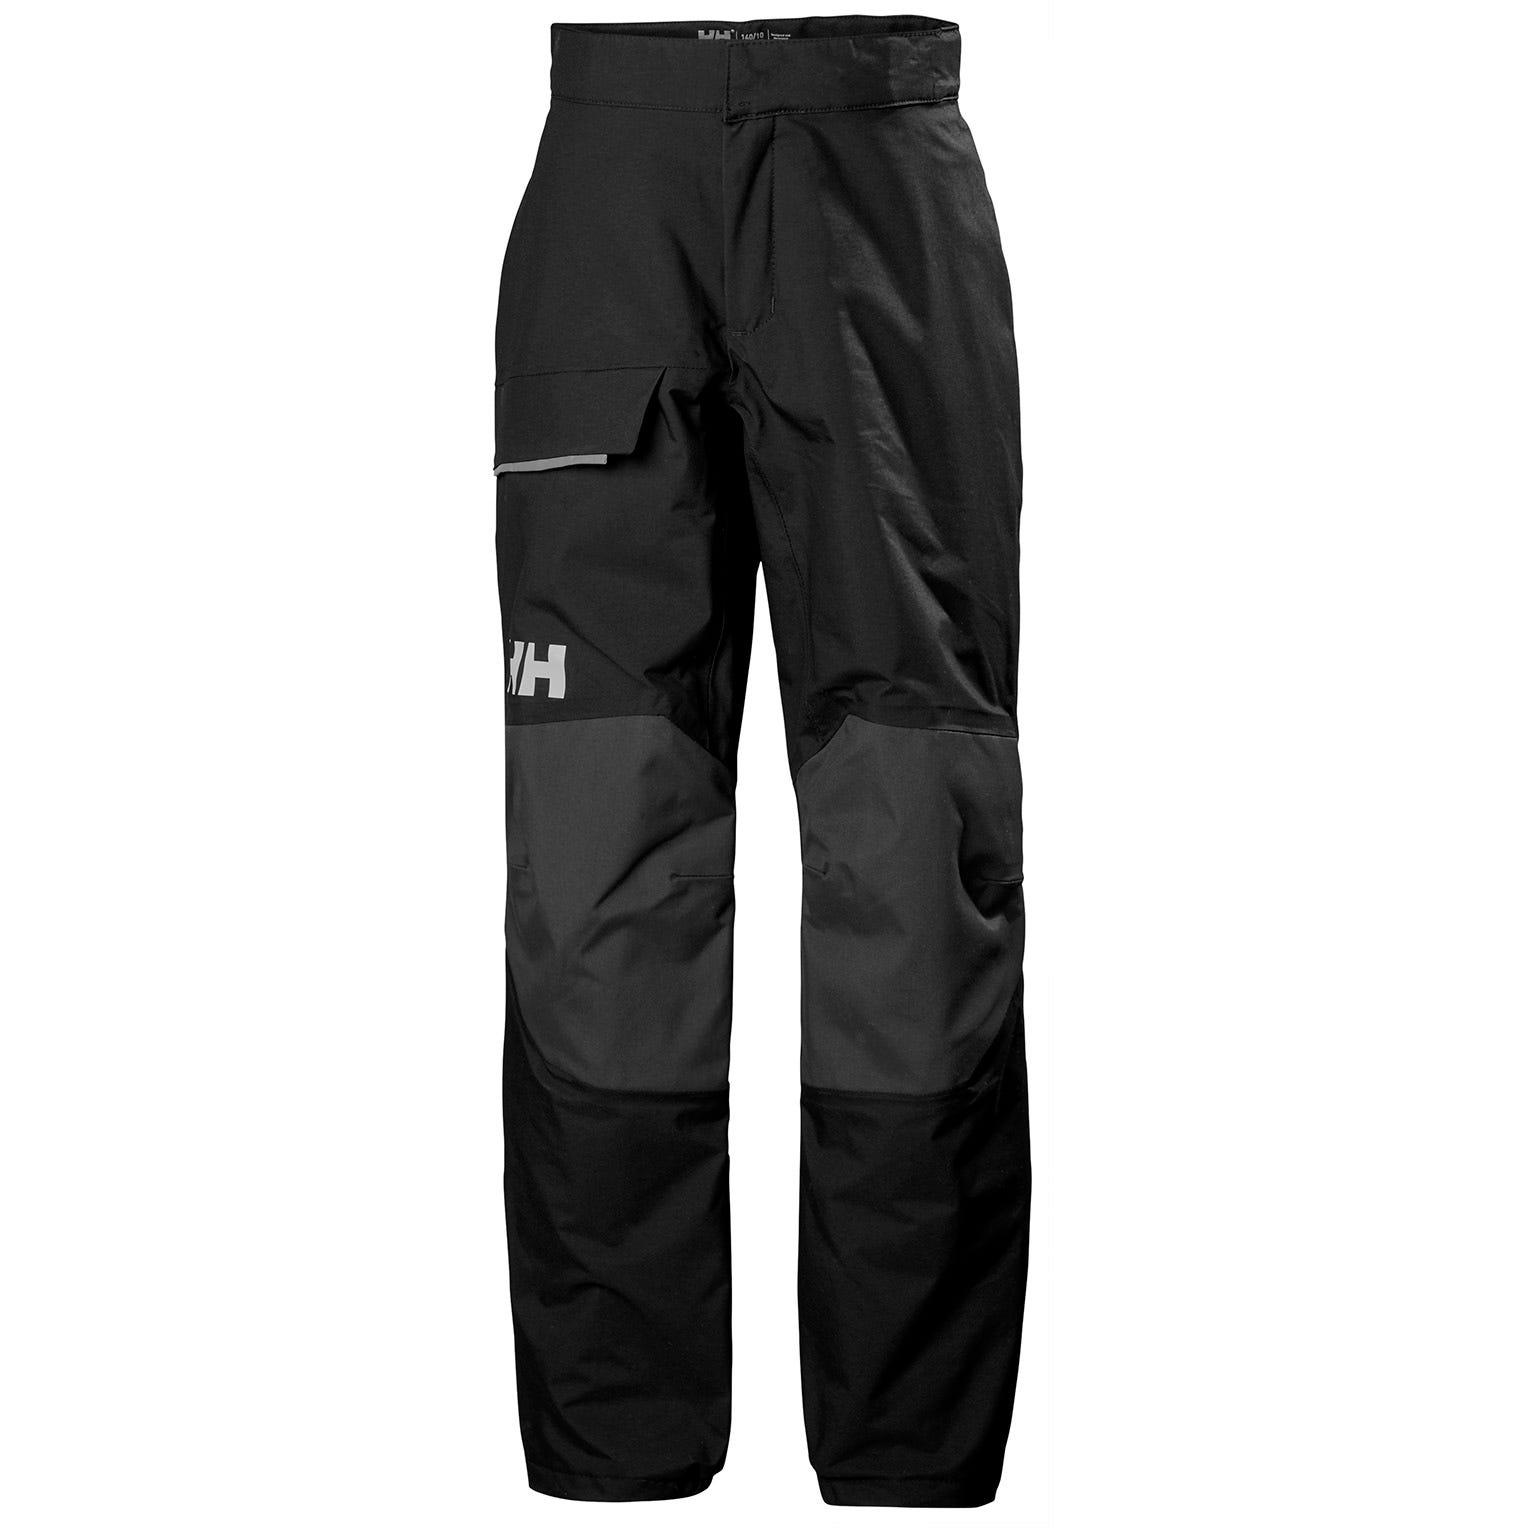 Helly Hansen Junior Border Pant Kids Black 152/12